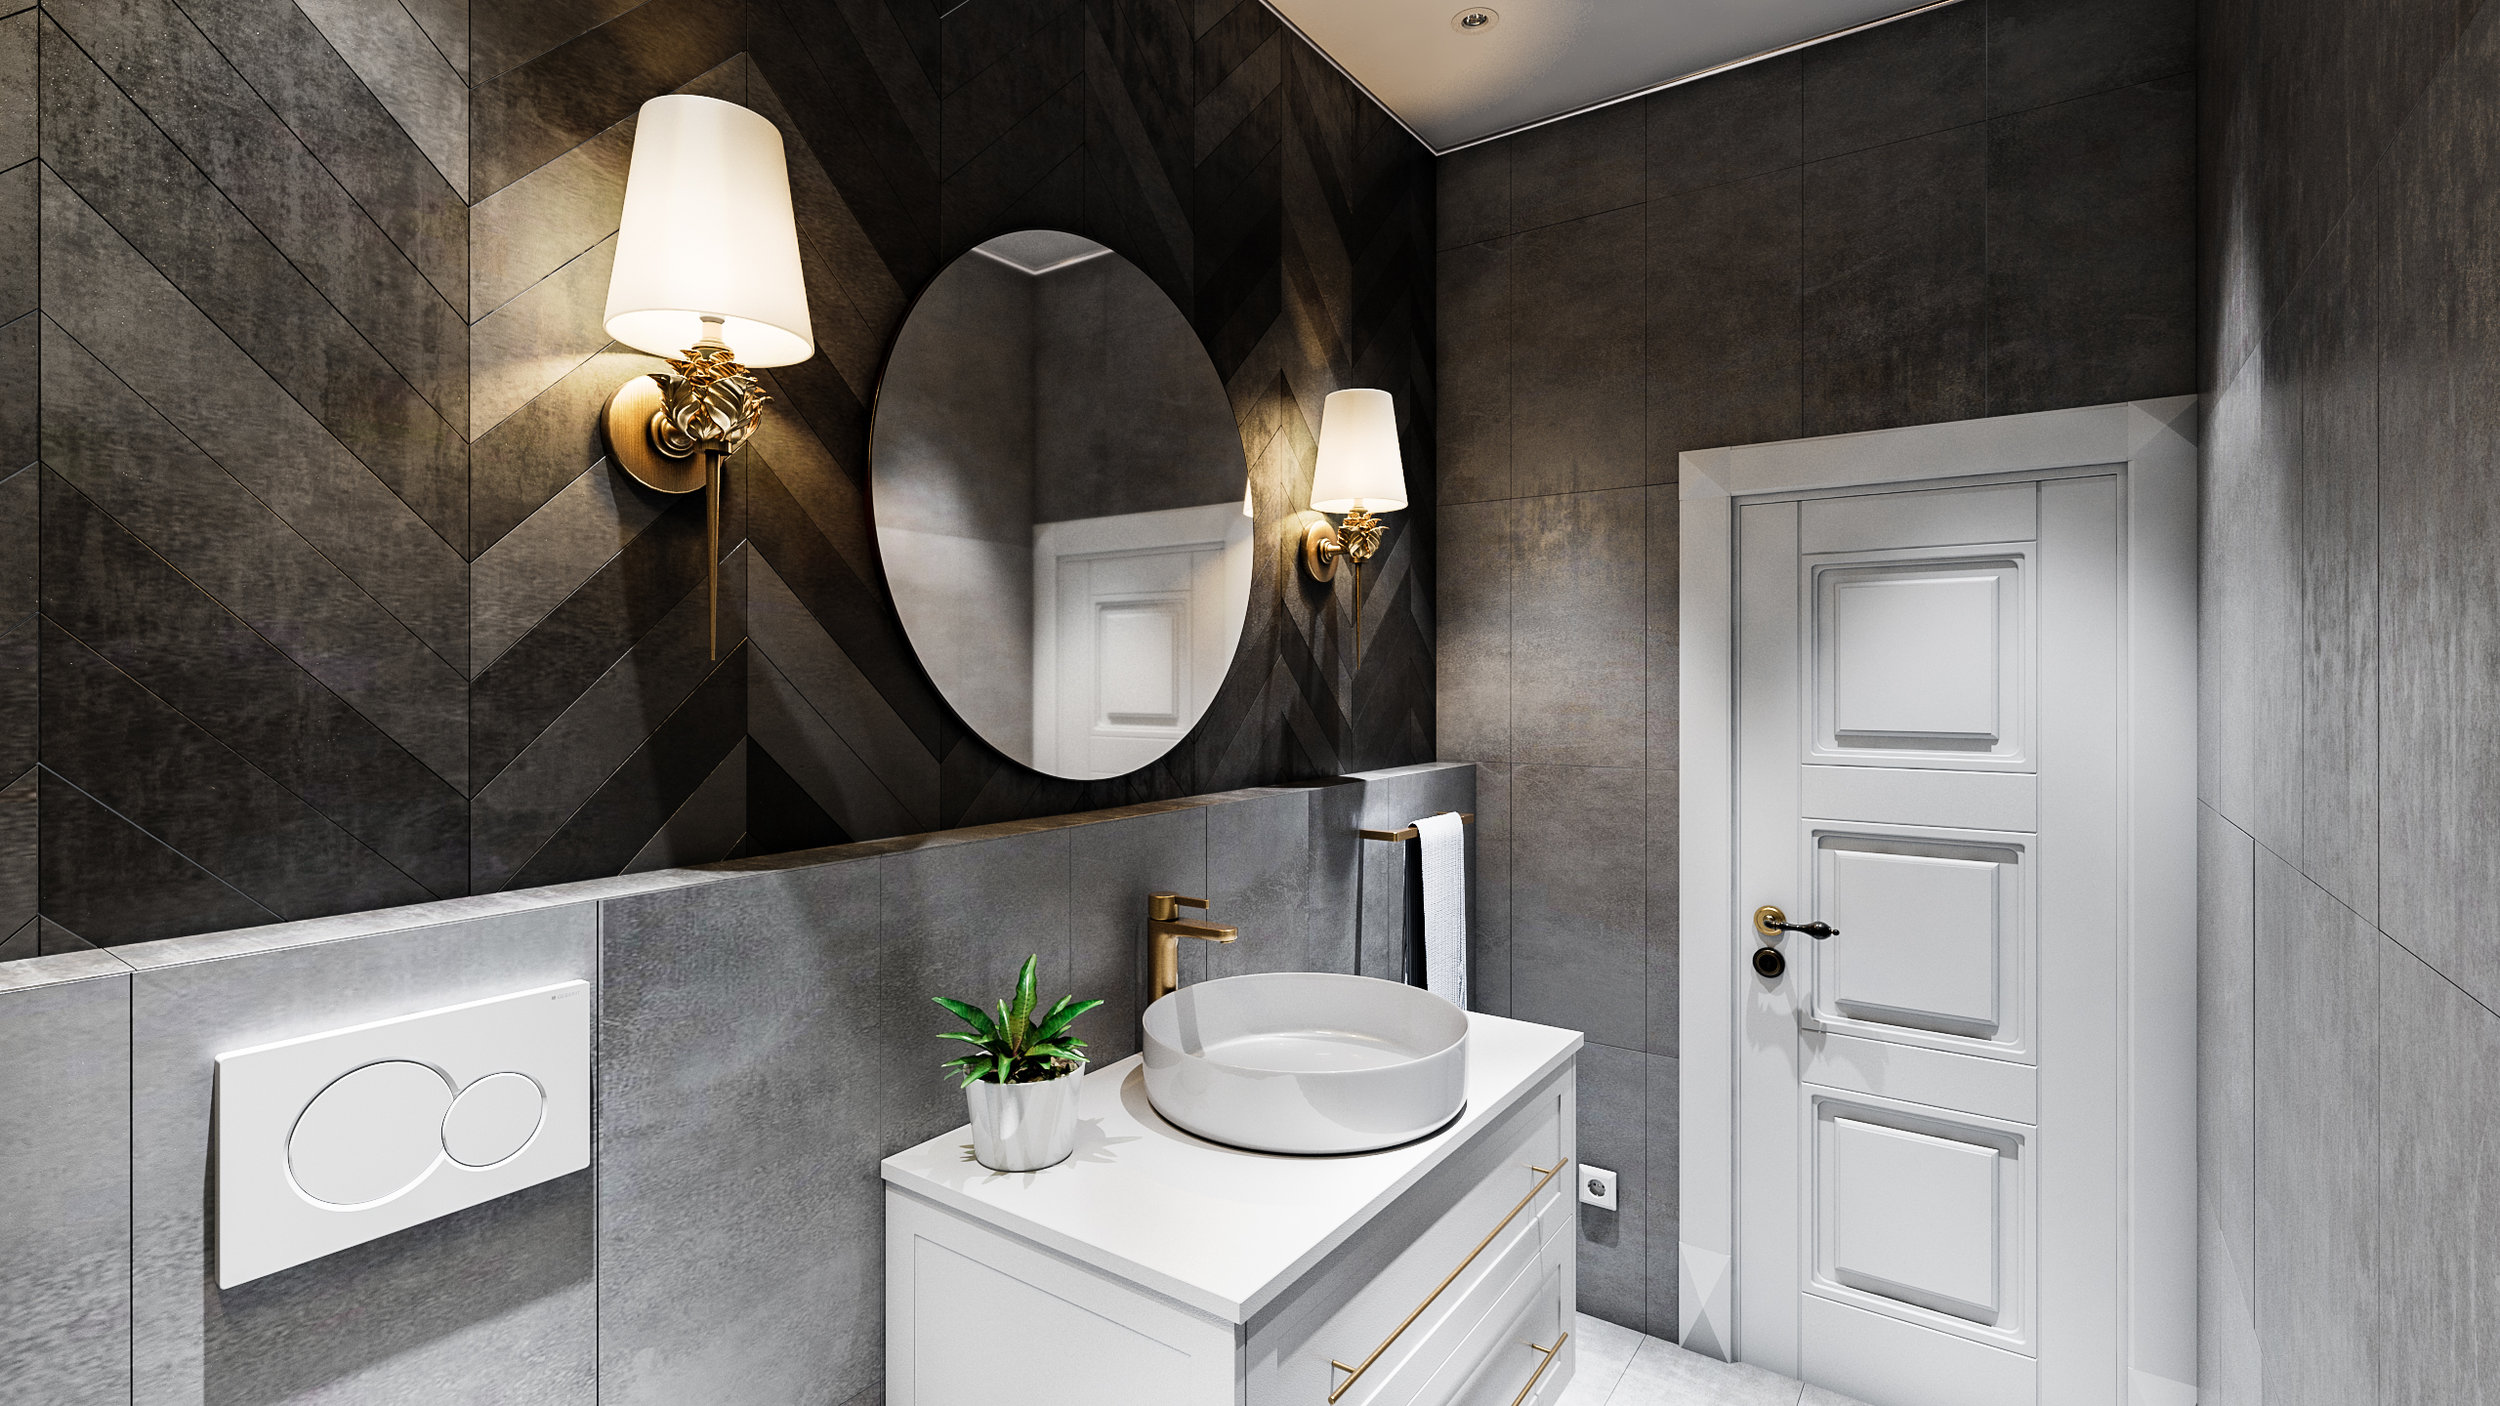 Bathroom_3D view 2_Final.jpg